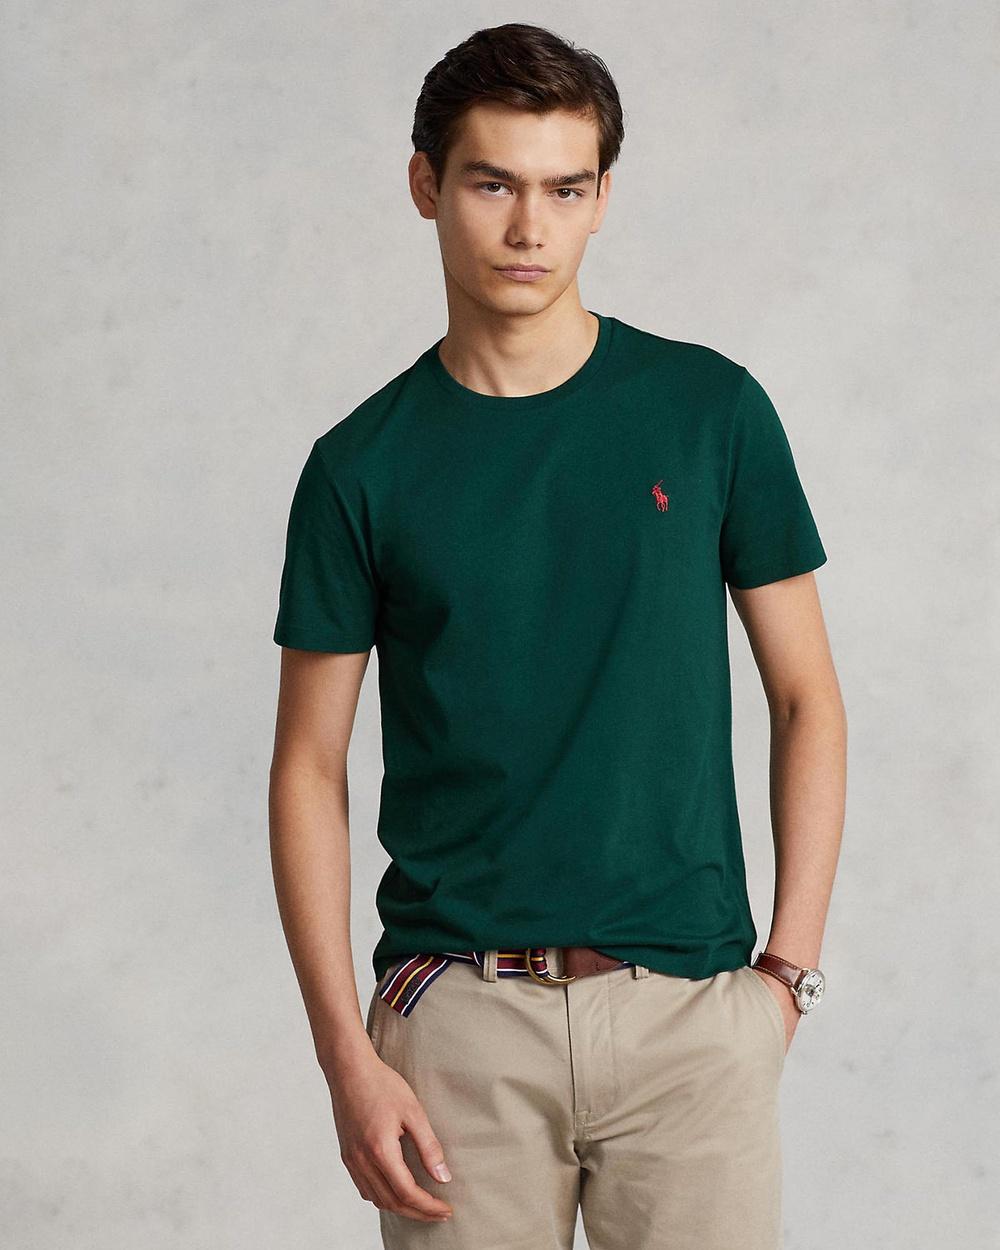 Polo Ralph Lauren - ICONIC EXCLUSIVE   Custom Slim Fit Short Sleeve T Shirt - T-Shirts & Singlets (College Green) ICONIC EXCLUSIVE - Custom Slim Fit Short Sleeve T-Shirt